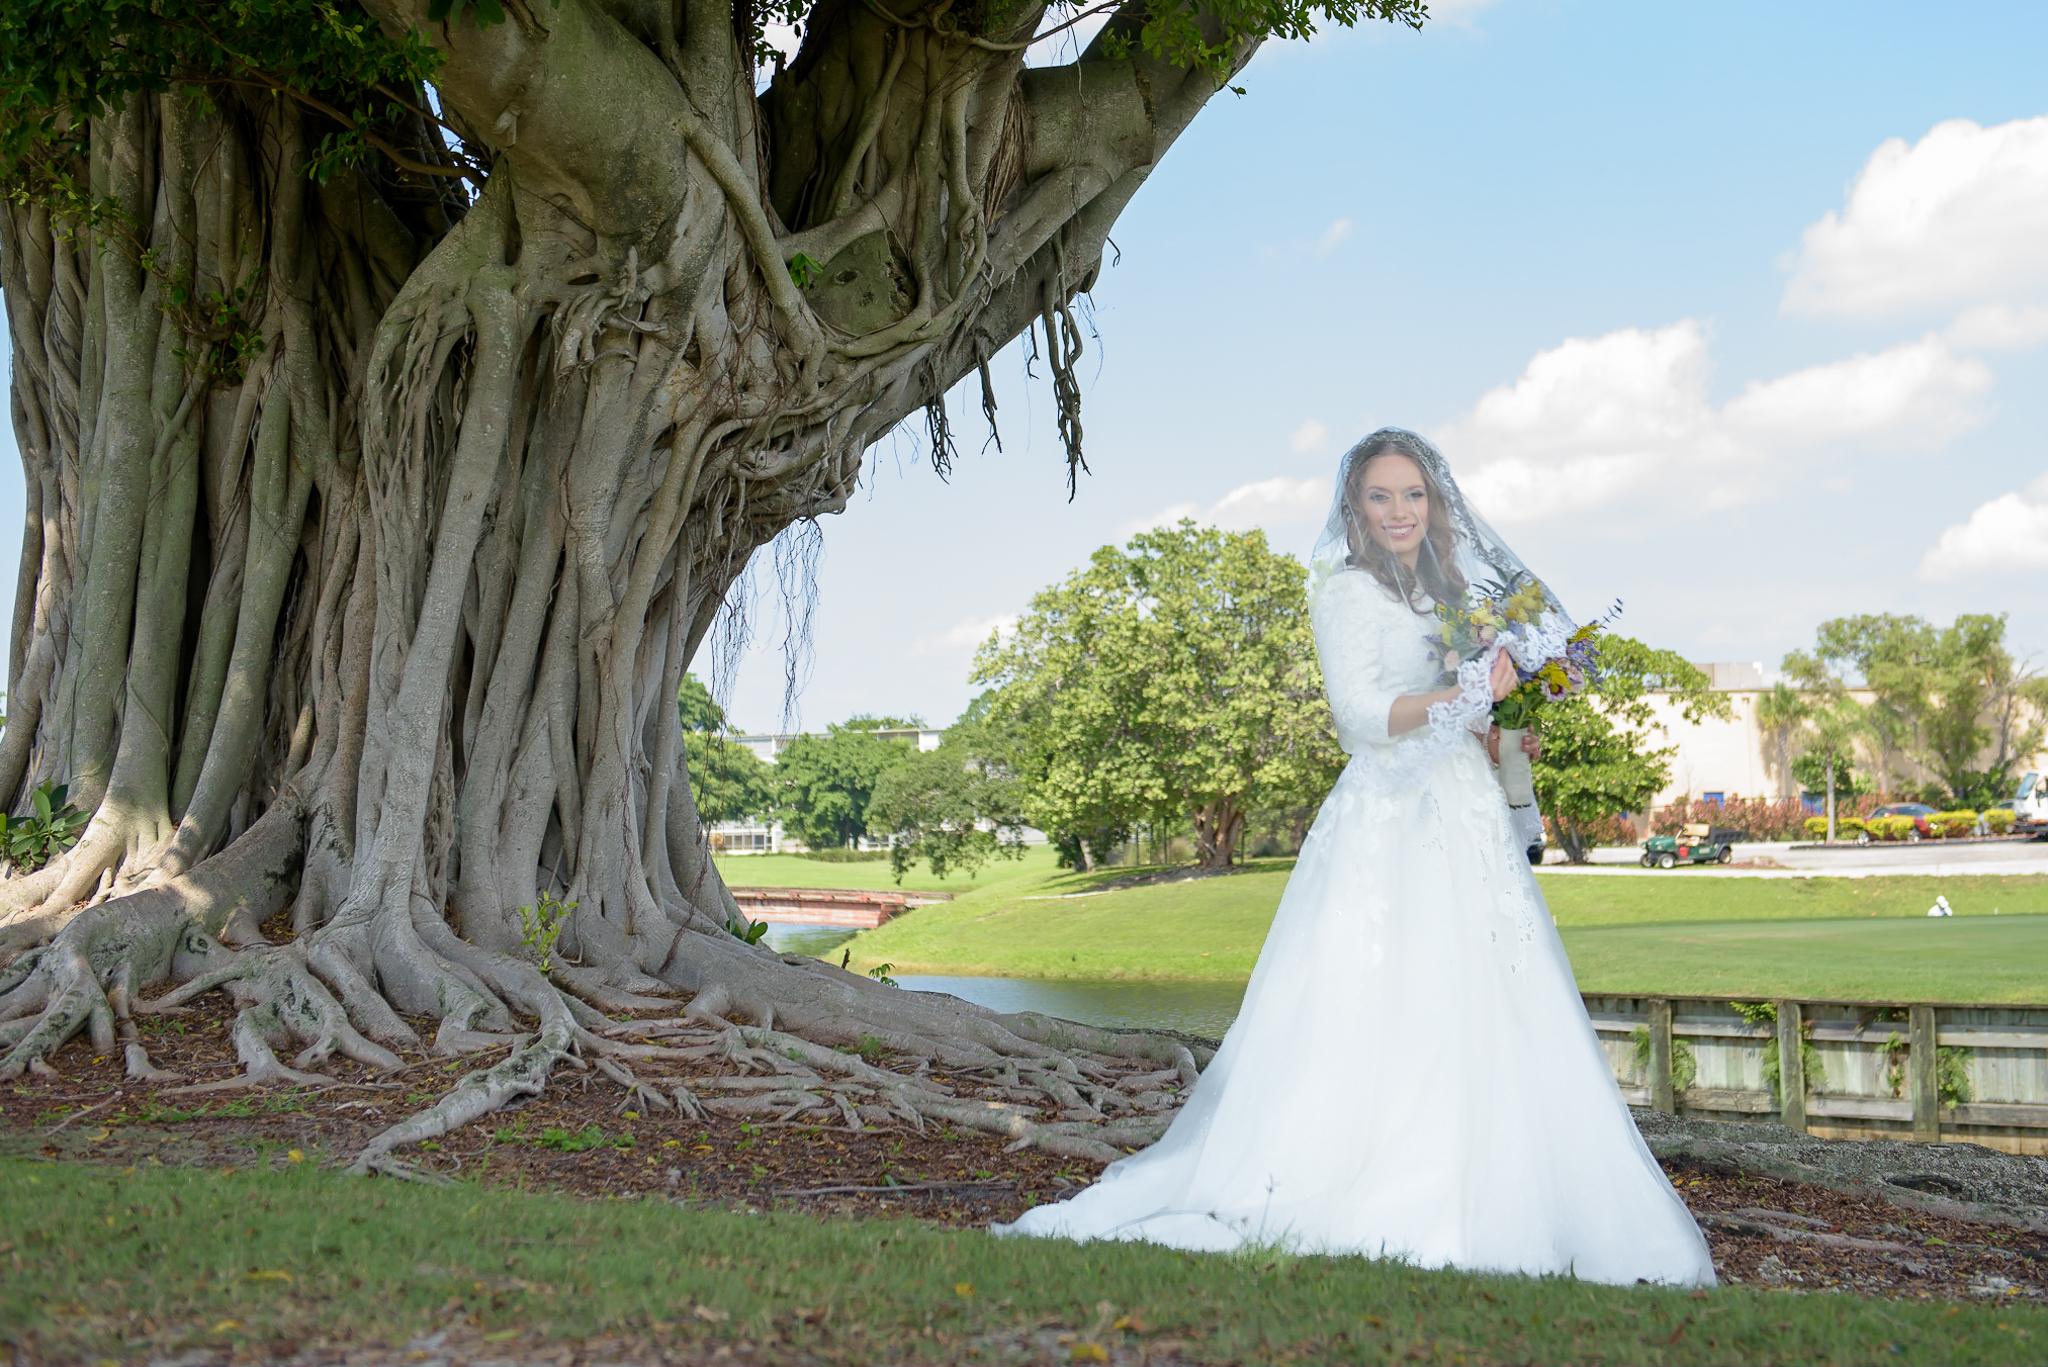 Wedding by Levikfoto.com-005.jpg